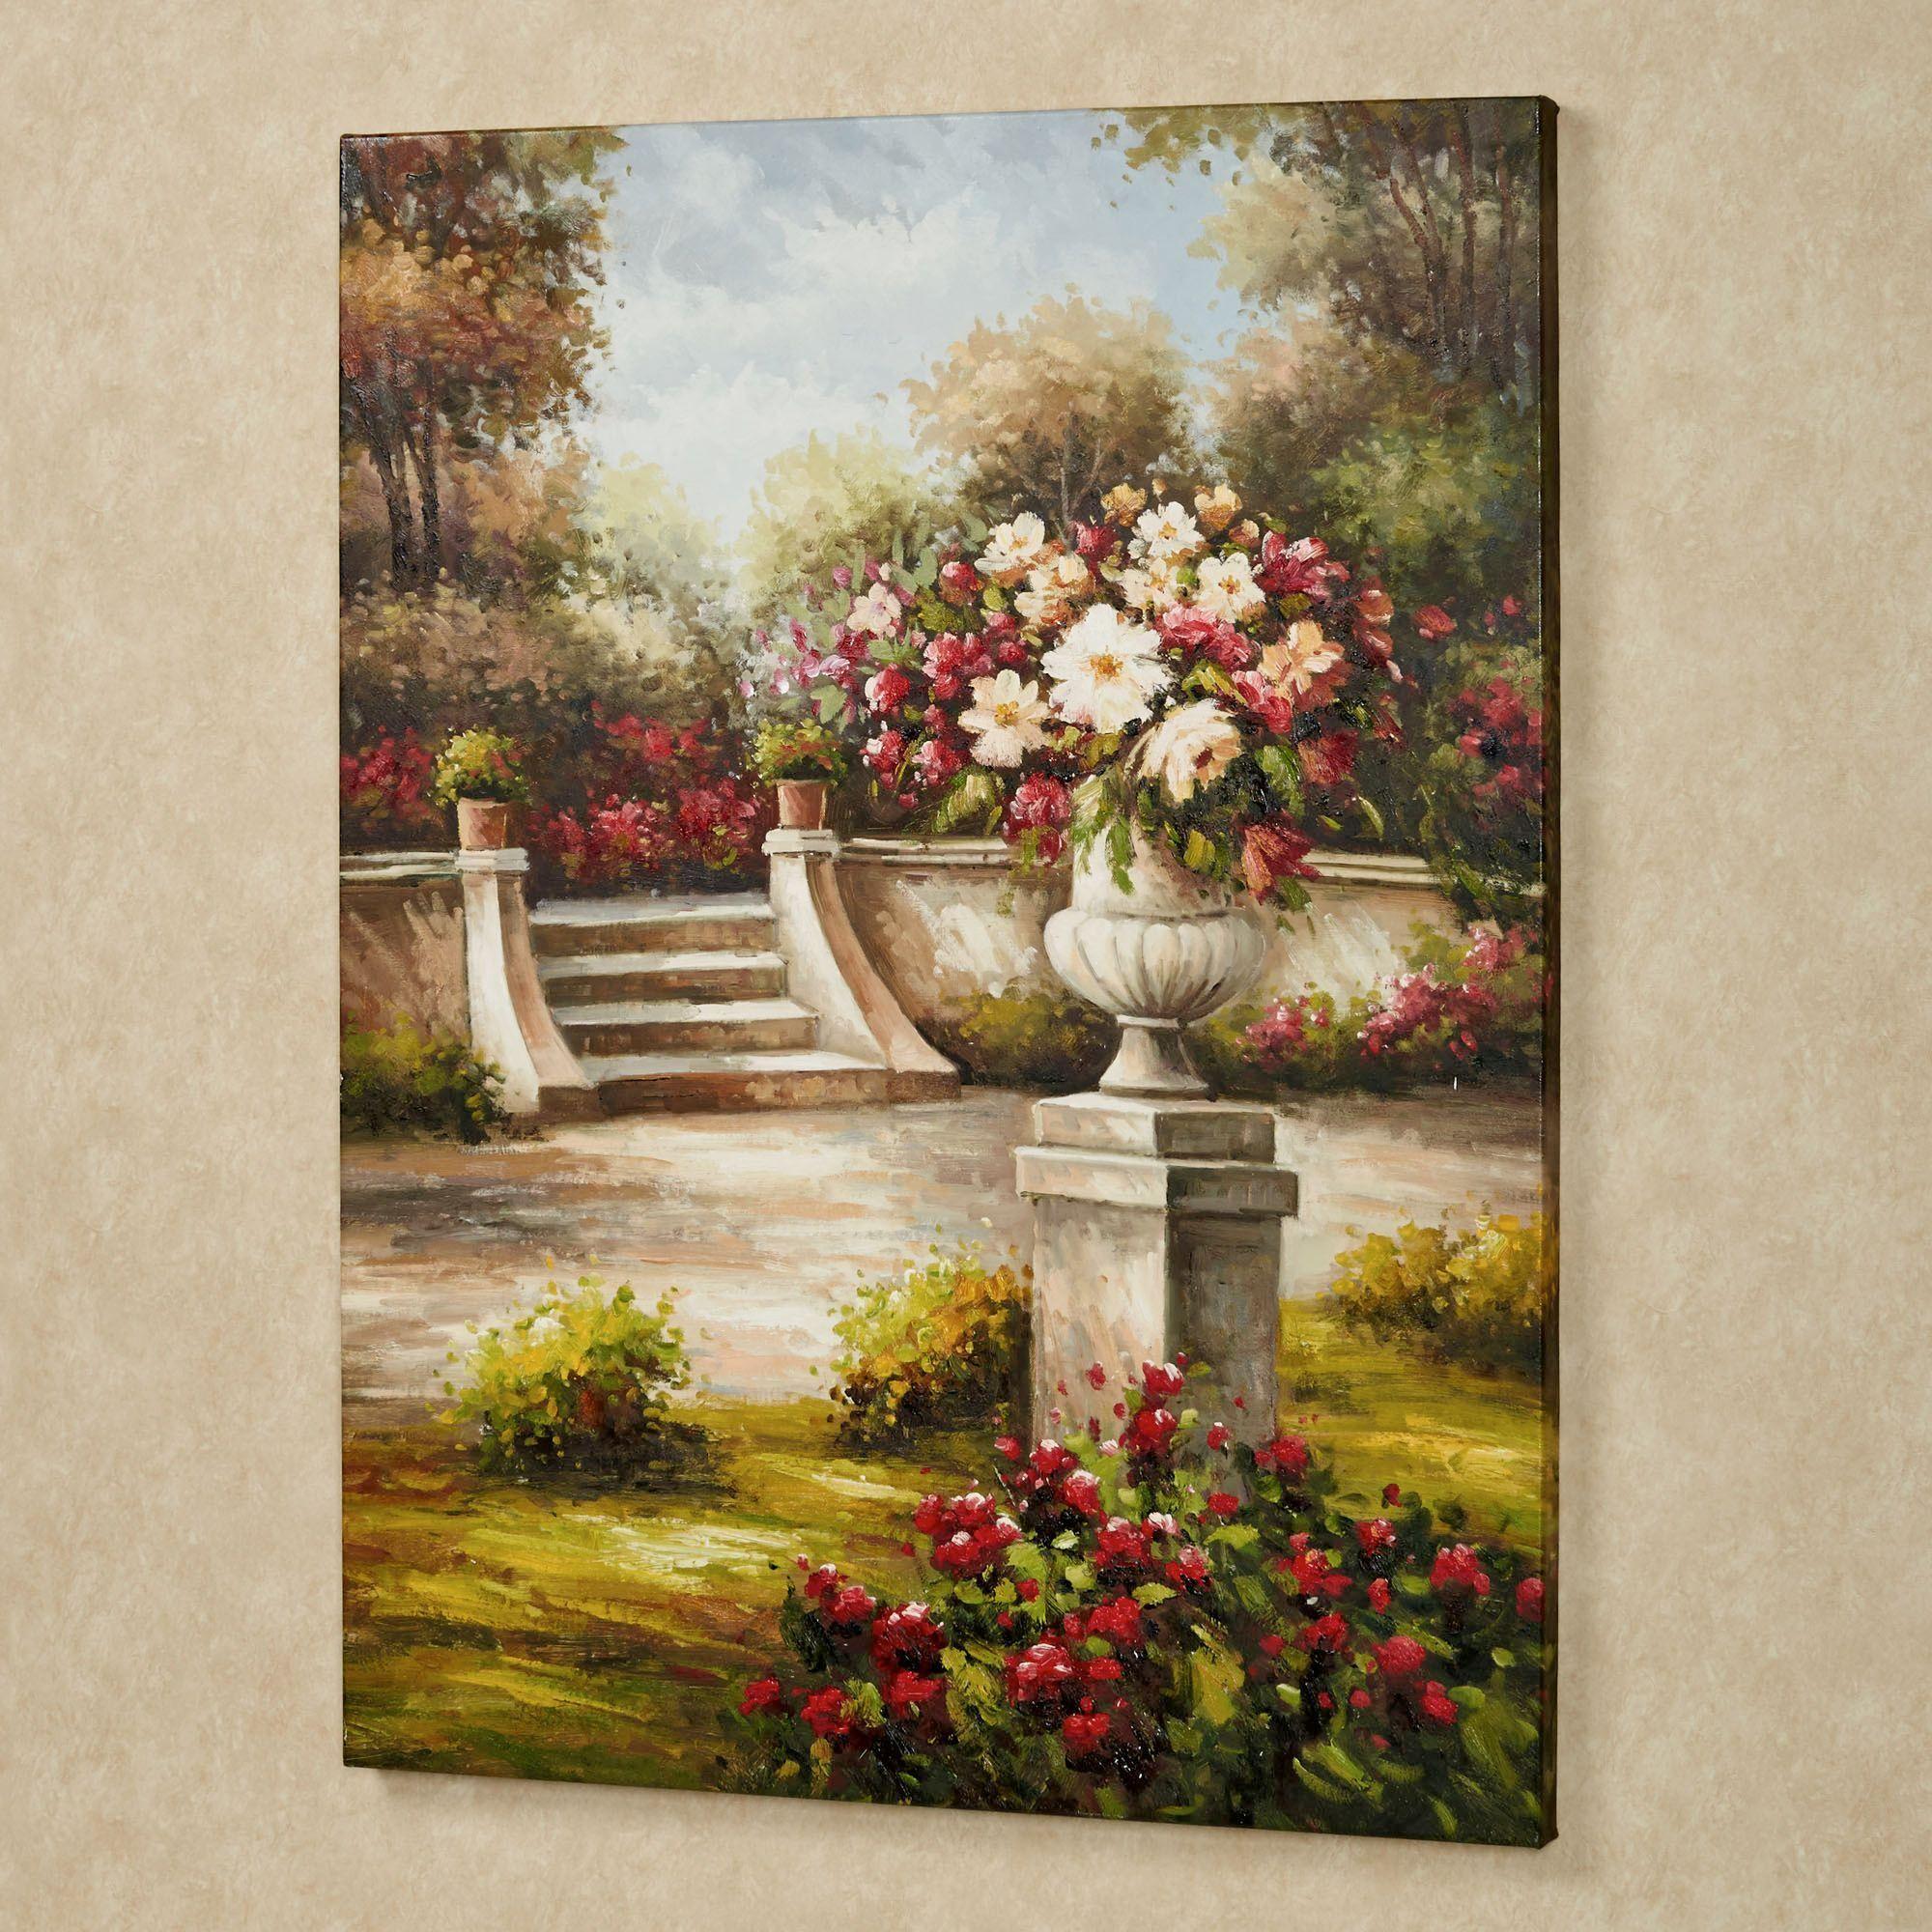 Enchanted Garden: Enchanted Garden Handpainted Canvas Art